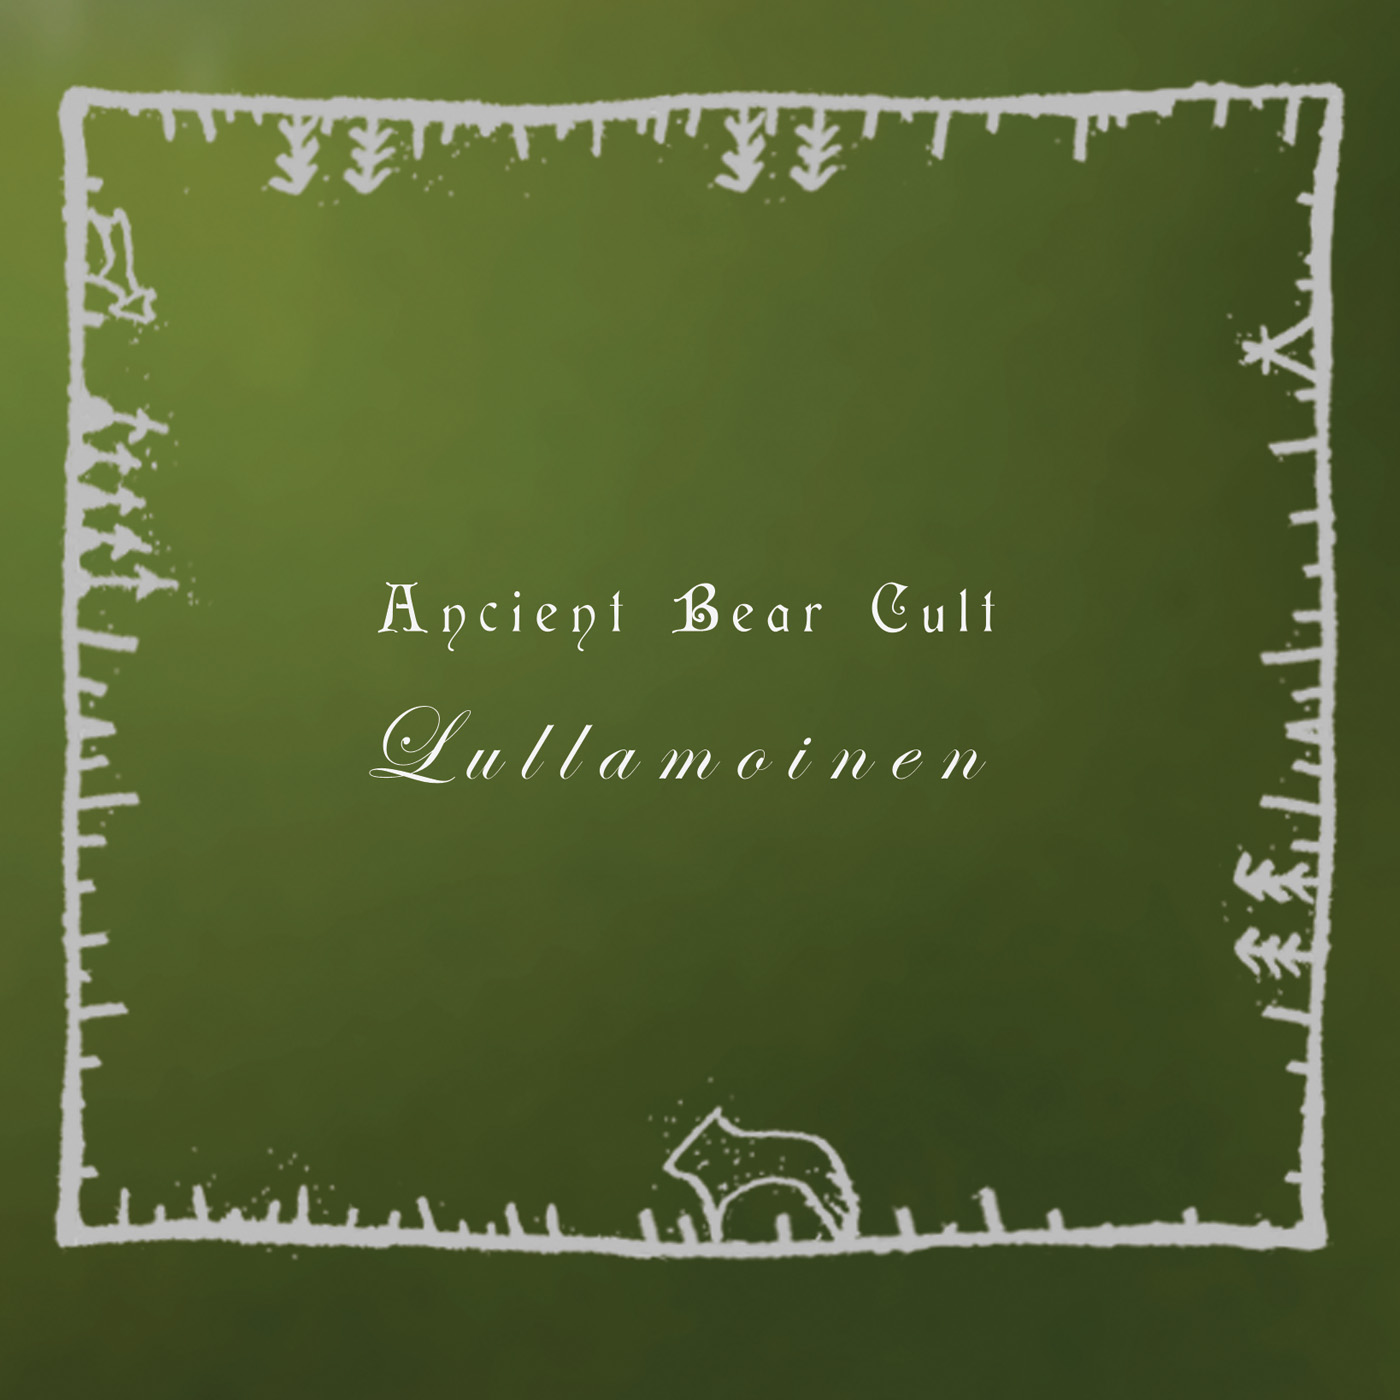 Angient Bear Cult: Lullamoinen